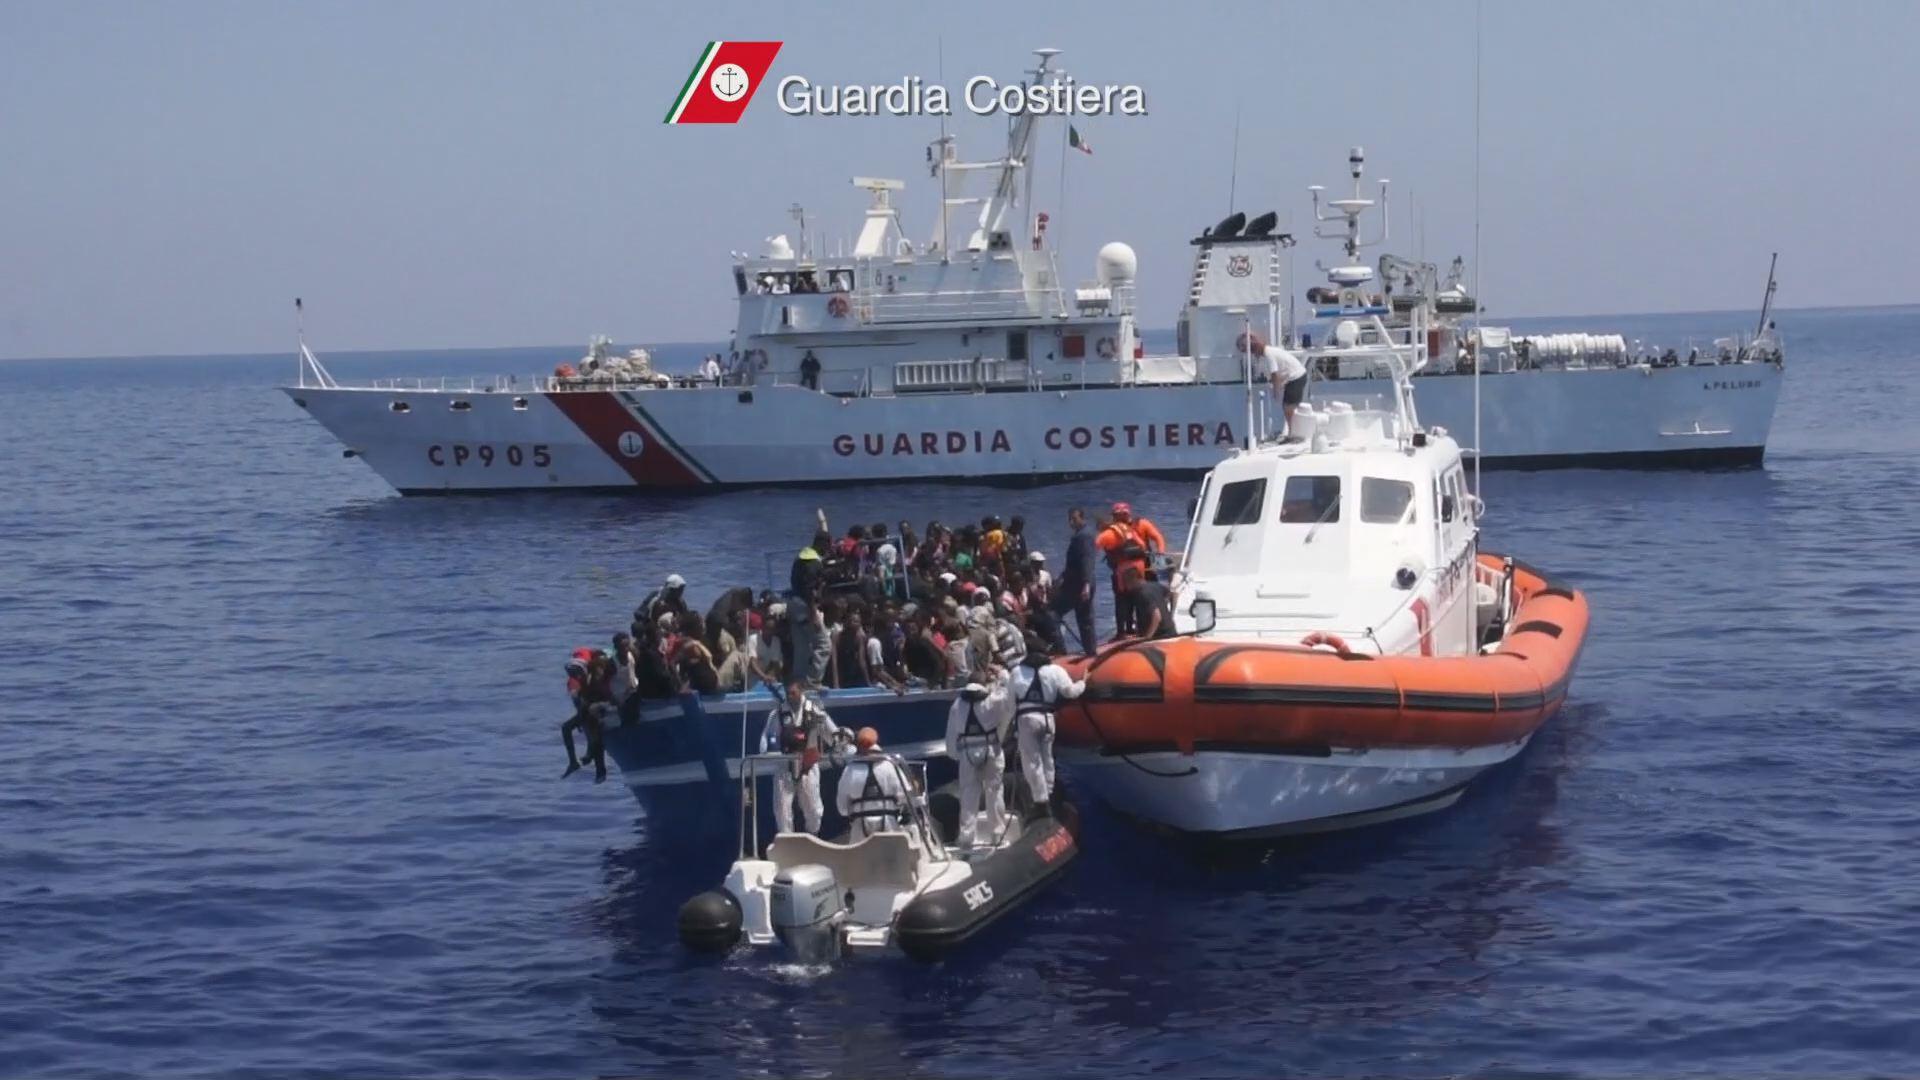 nave-peluso-migranti-portoempedocle1